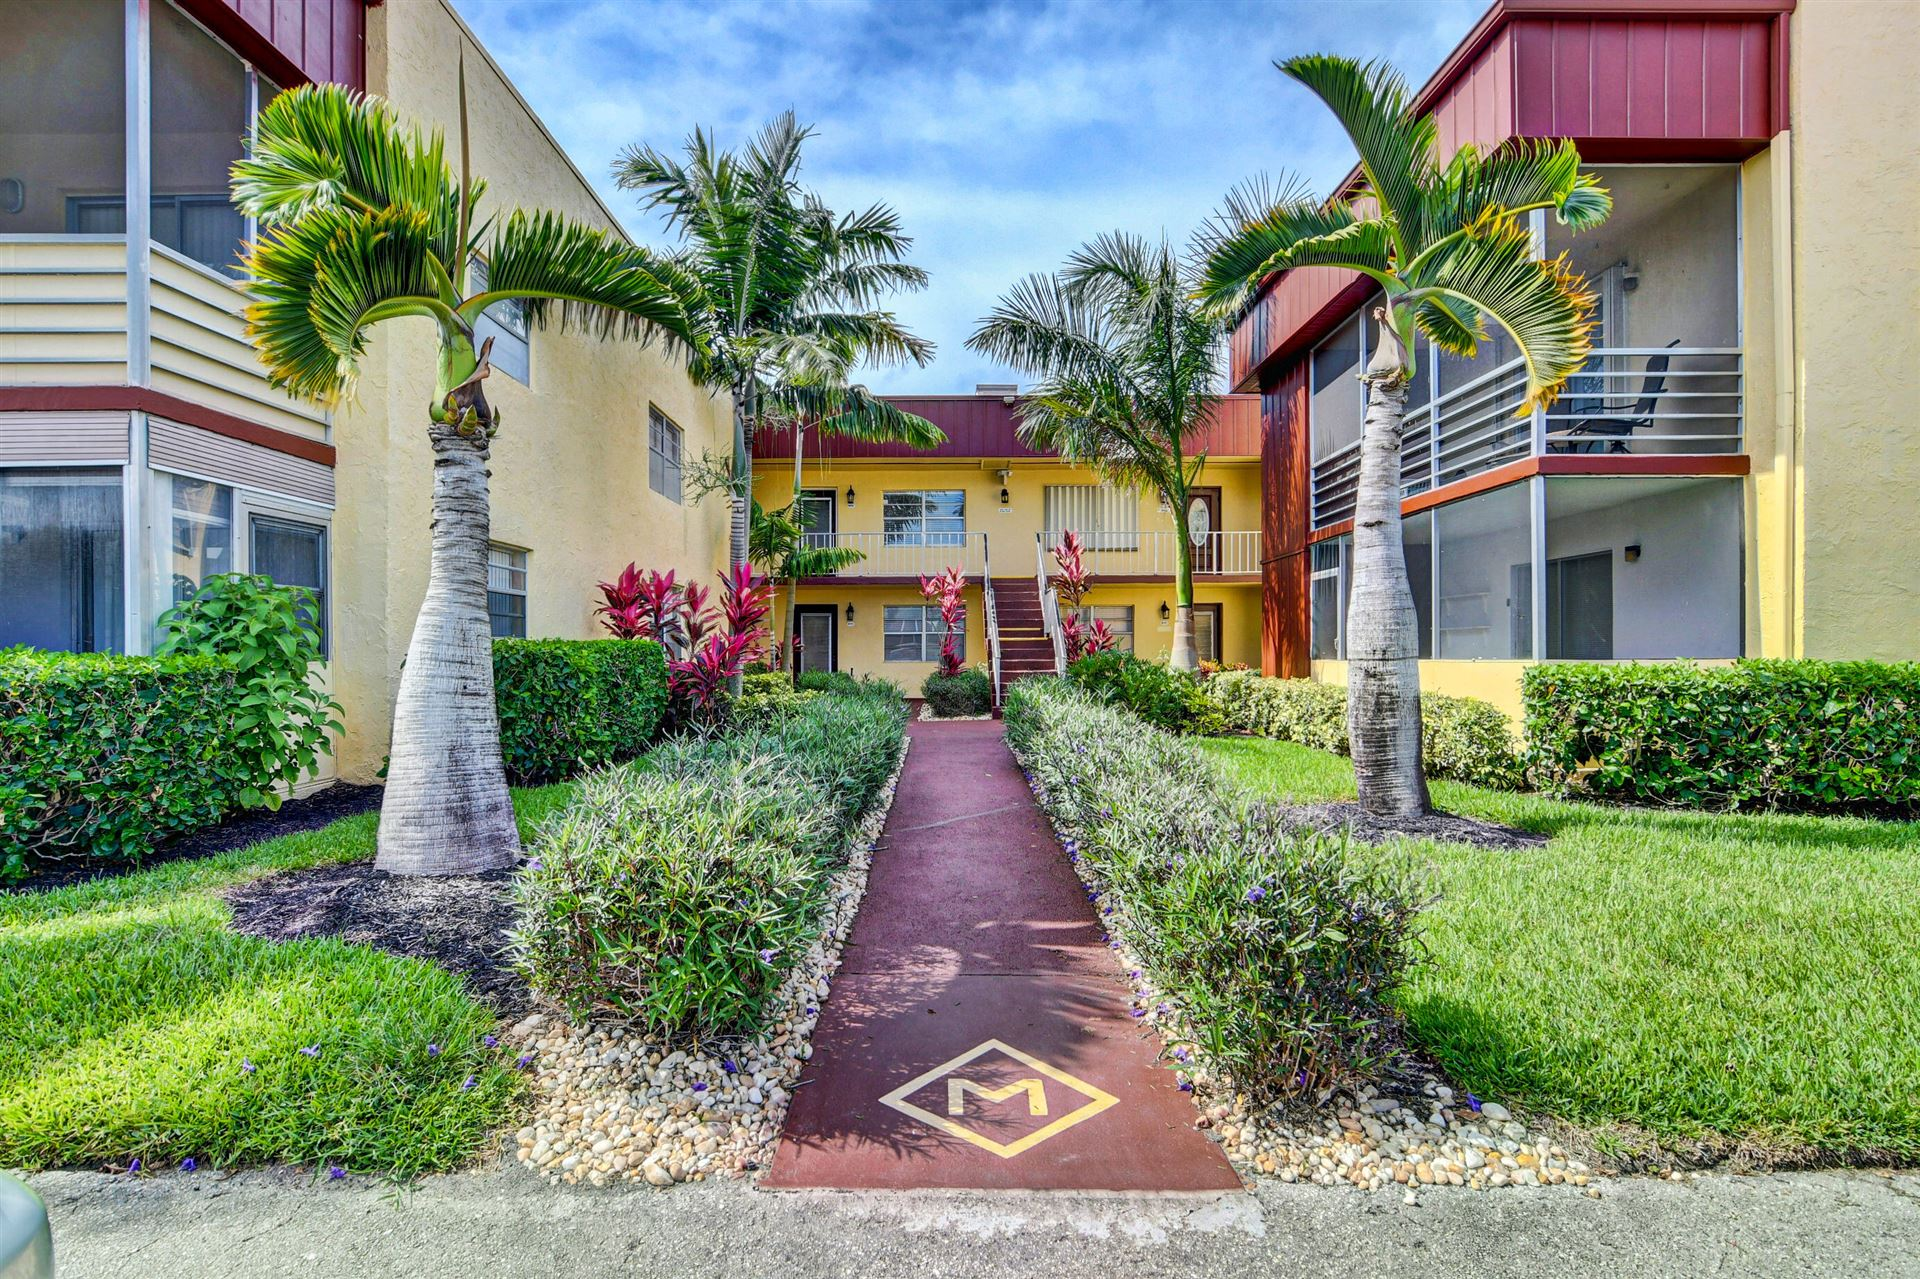 613 Flanders M, Delray Beach, FL 33484 - MLS#: RX-10721795